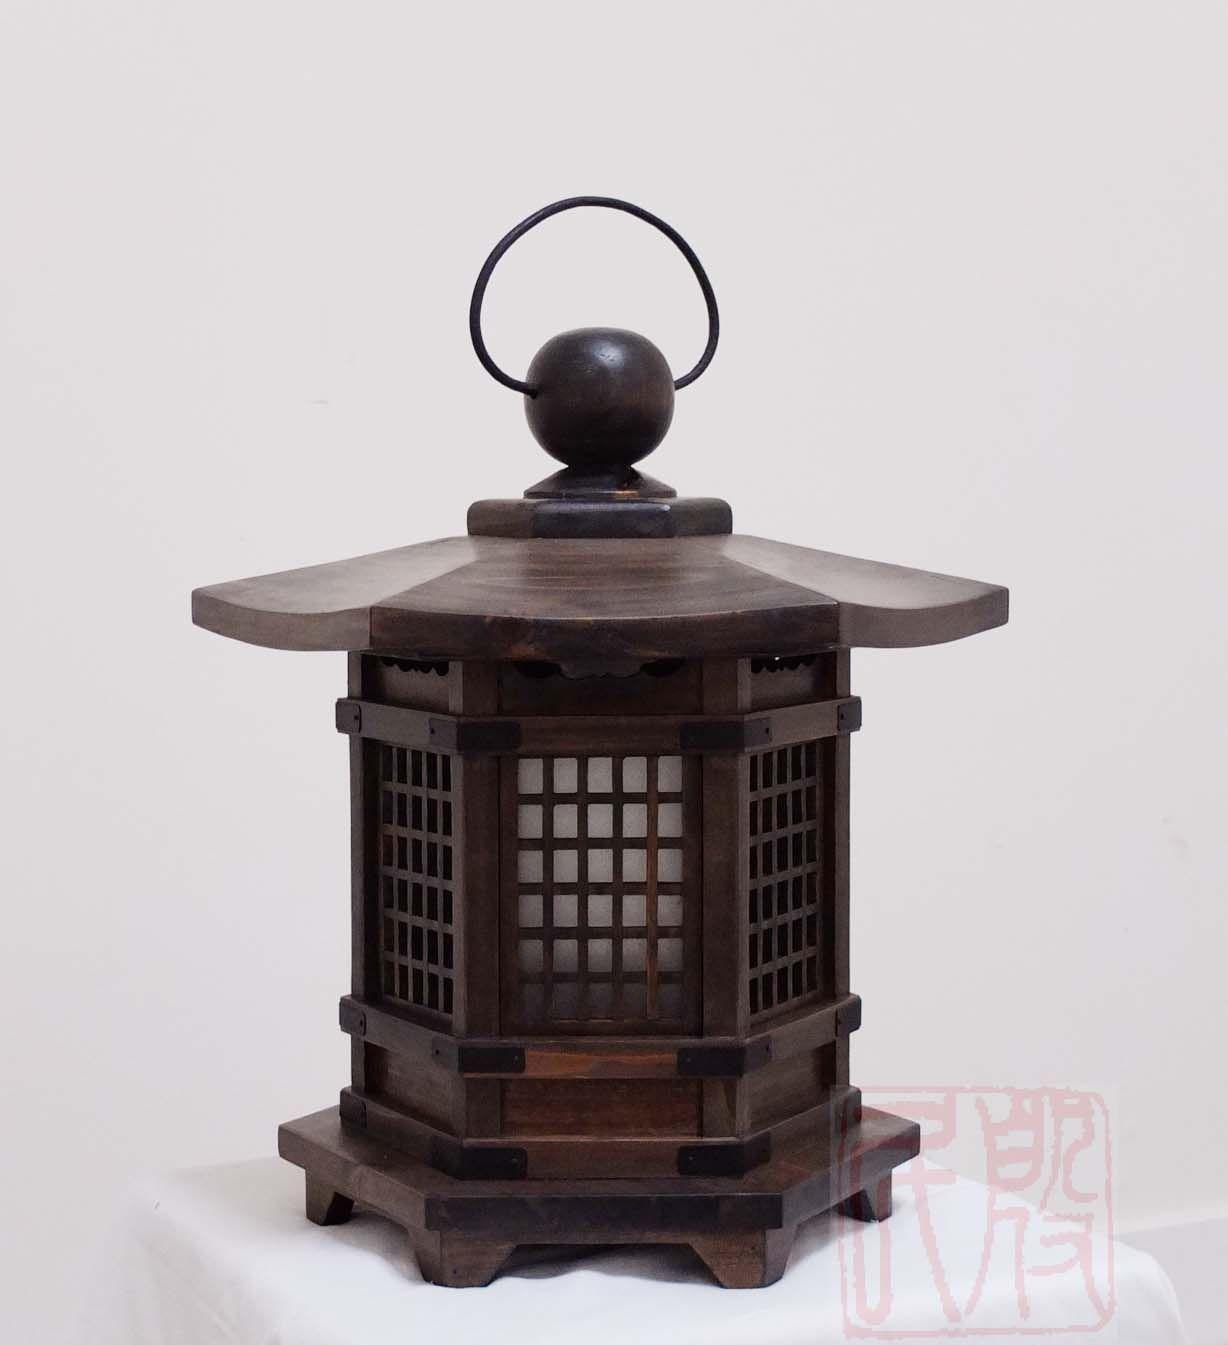 Pagoda lantern wl on japanese lantern garden ornaments zen p